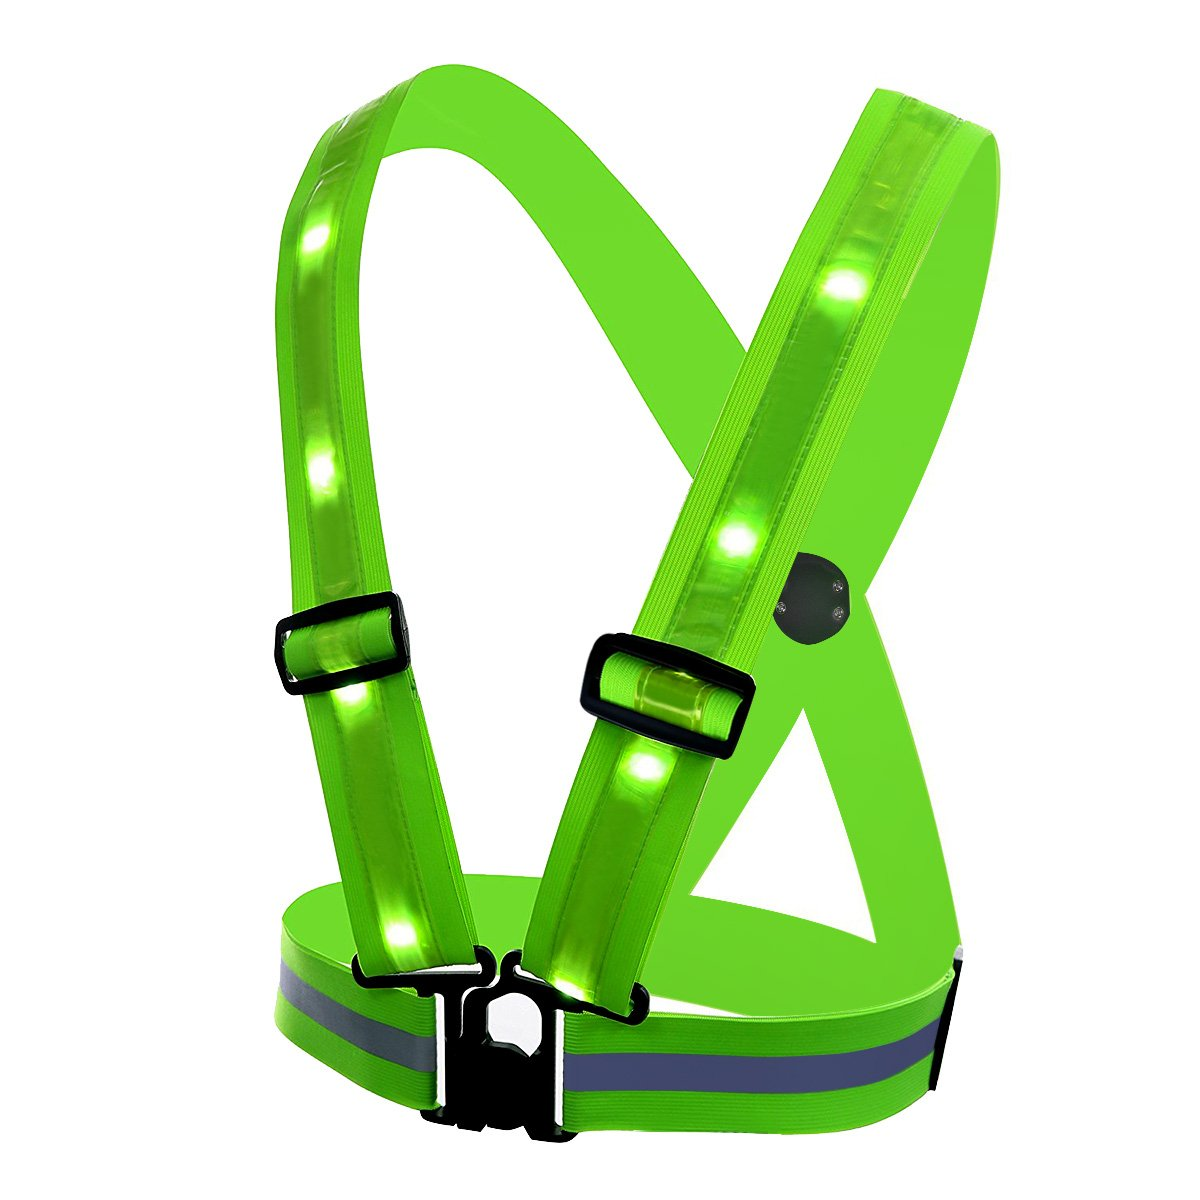 Adjustable Size Universal 360 Degree High Visibility Night Safety Vest 3 Modes USB Rechargeable LED Light /& Reflective Stripes TAGVO LED Reflective Vest